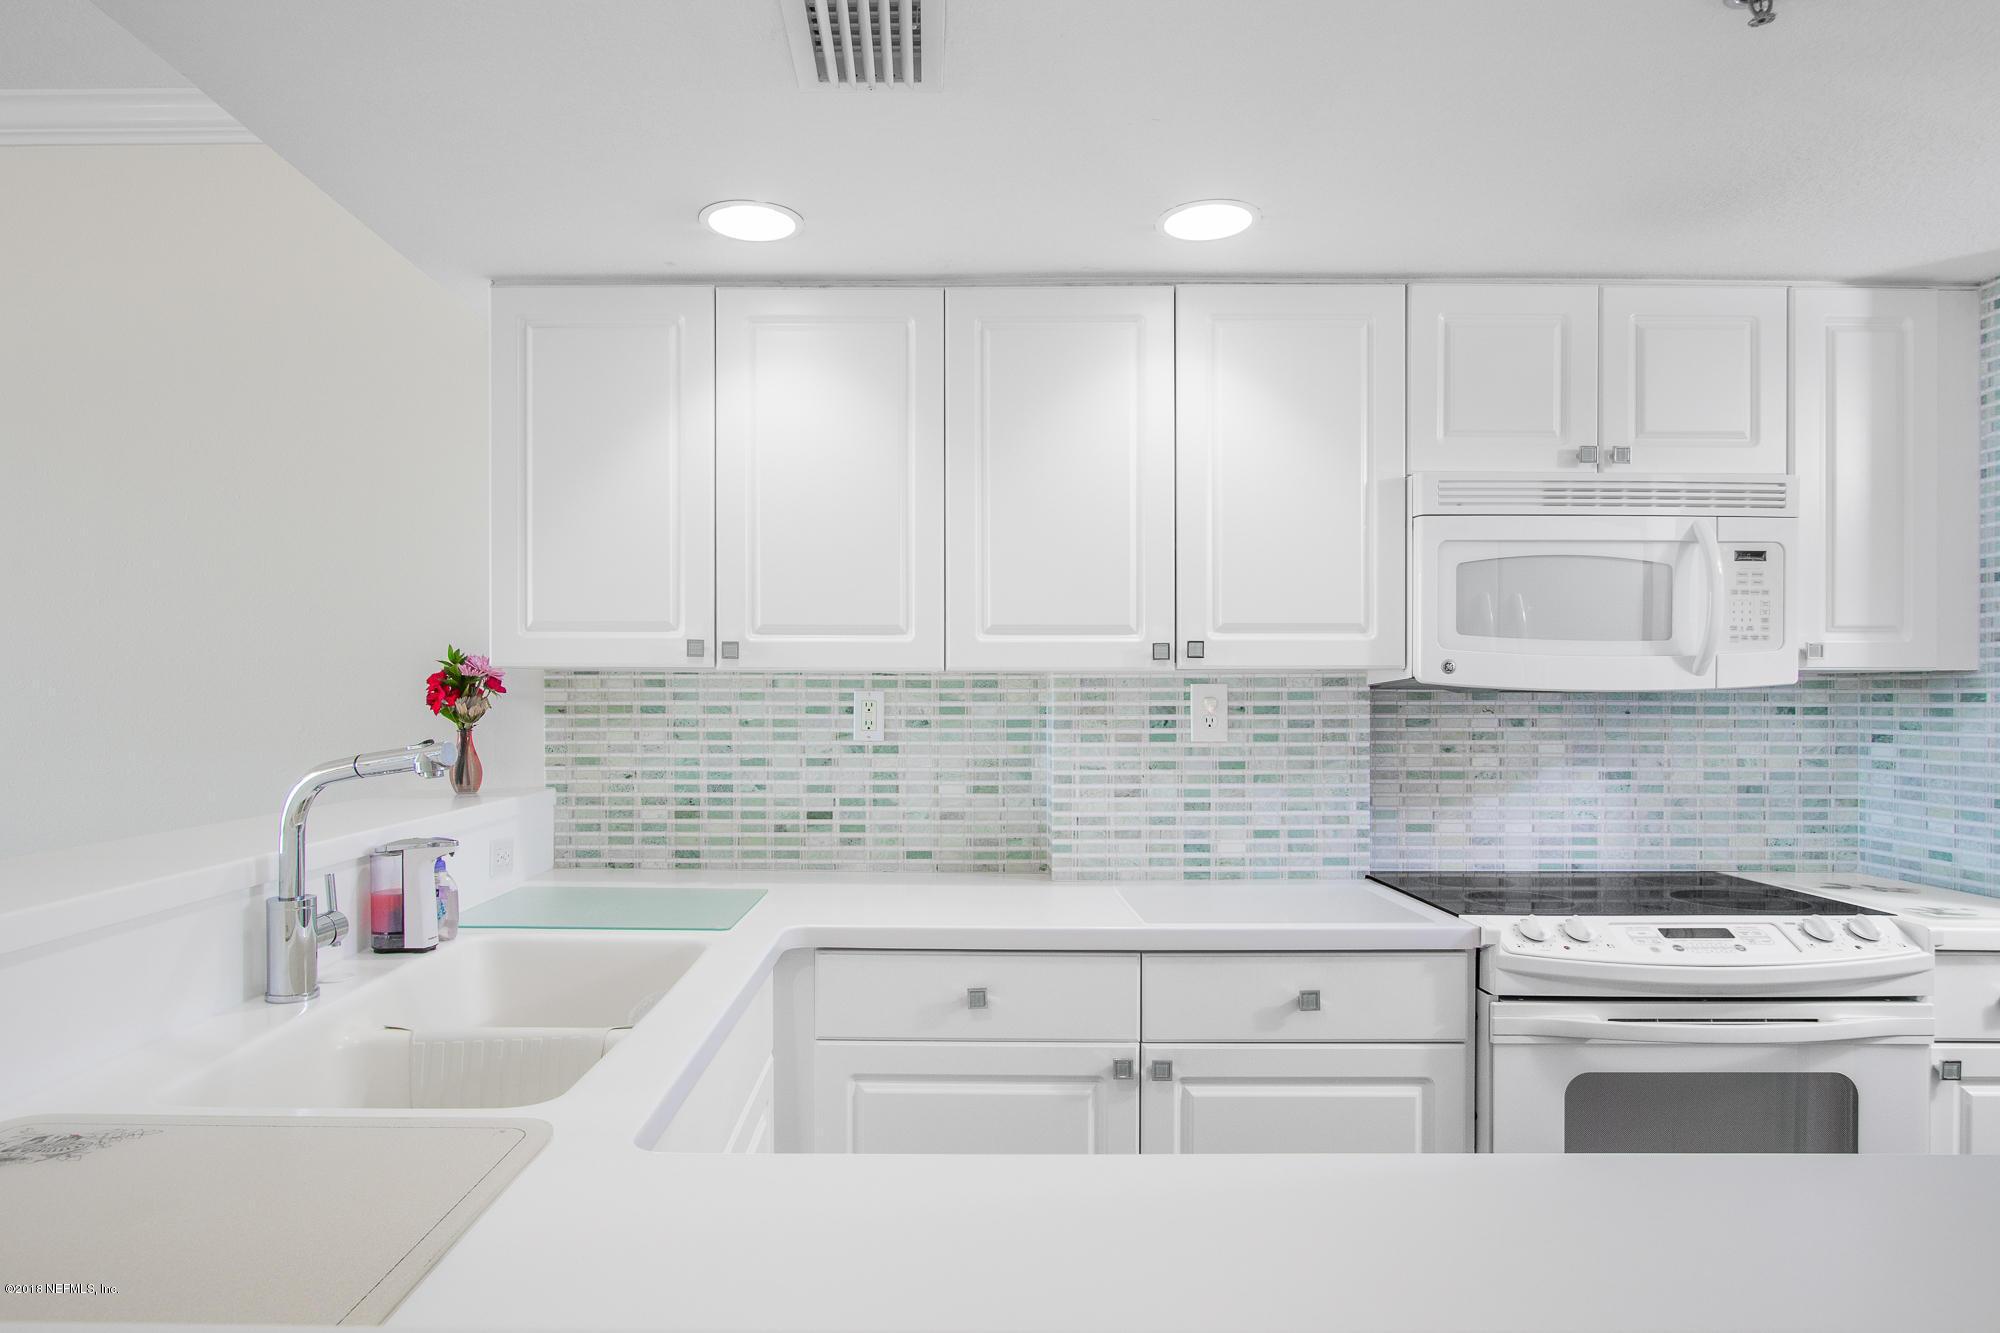 157 MARINE, ST AUGUSTINE, FLORIDA 32084, 2 Bedrooms Bedrooms, ,2 BathroomsBathrooms,Residential - condos/townhomes,For sale,MARINE,951870